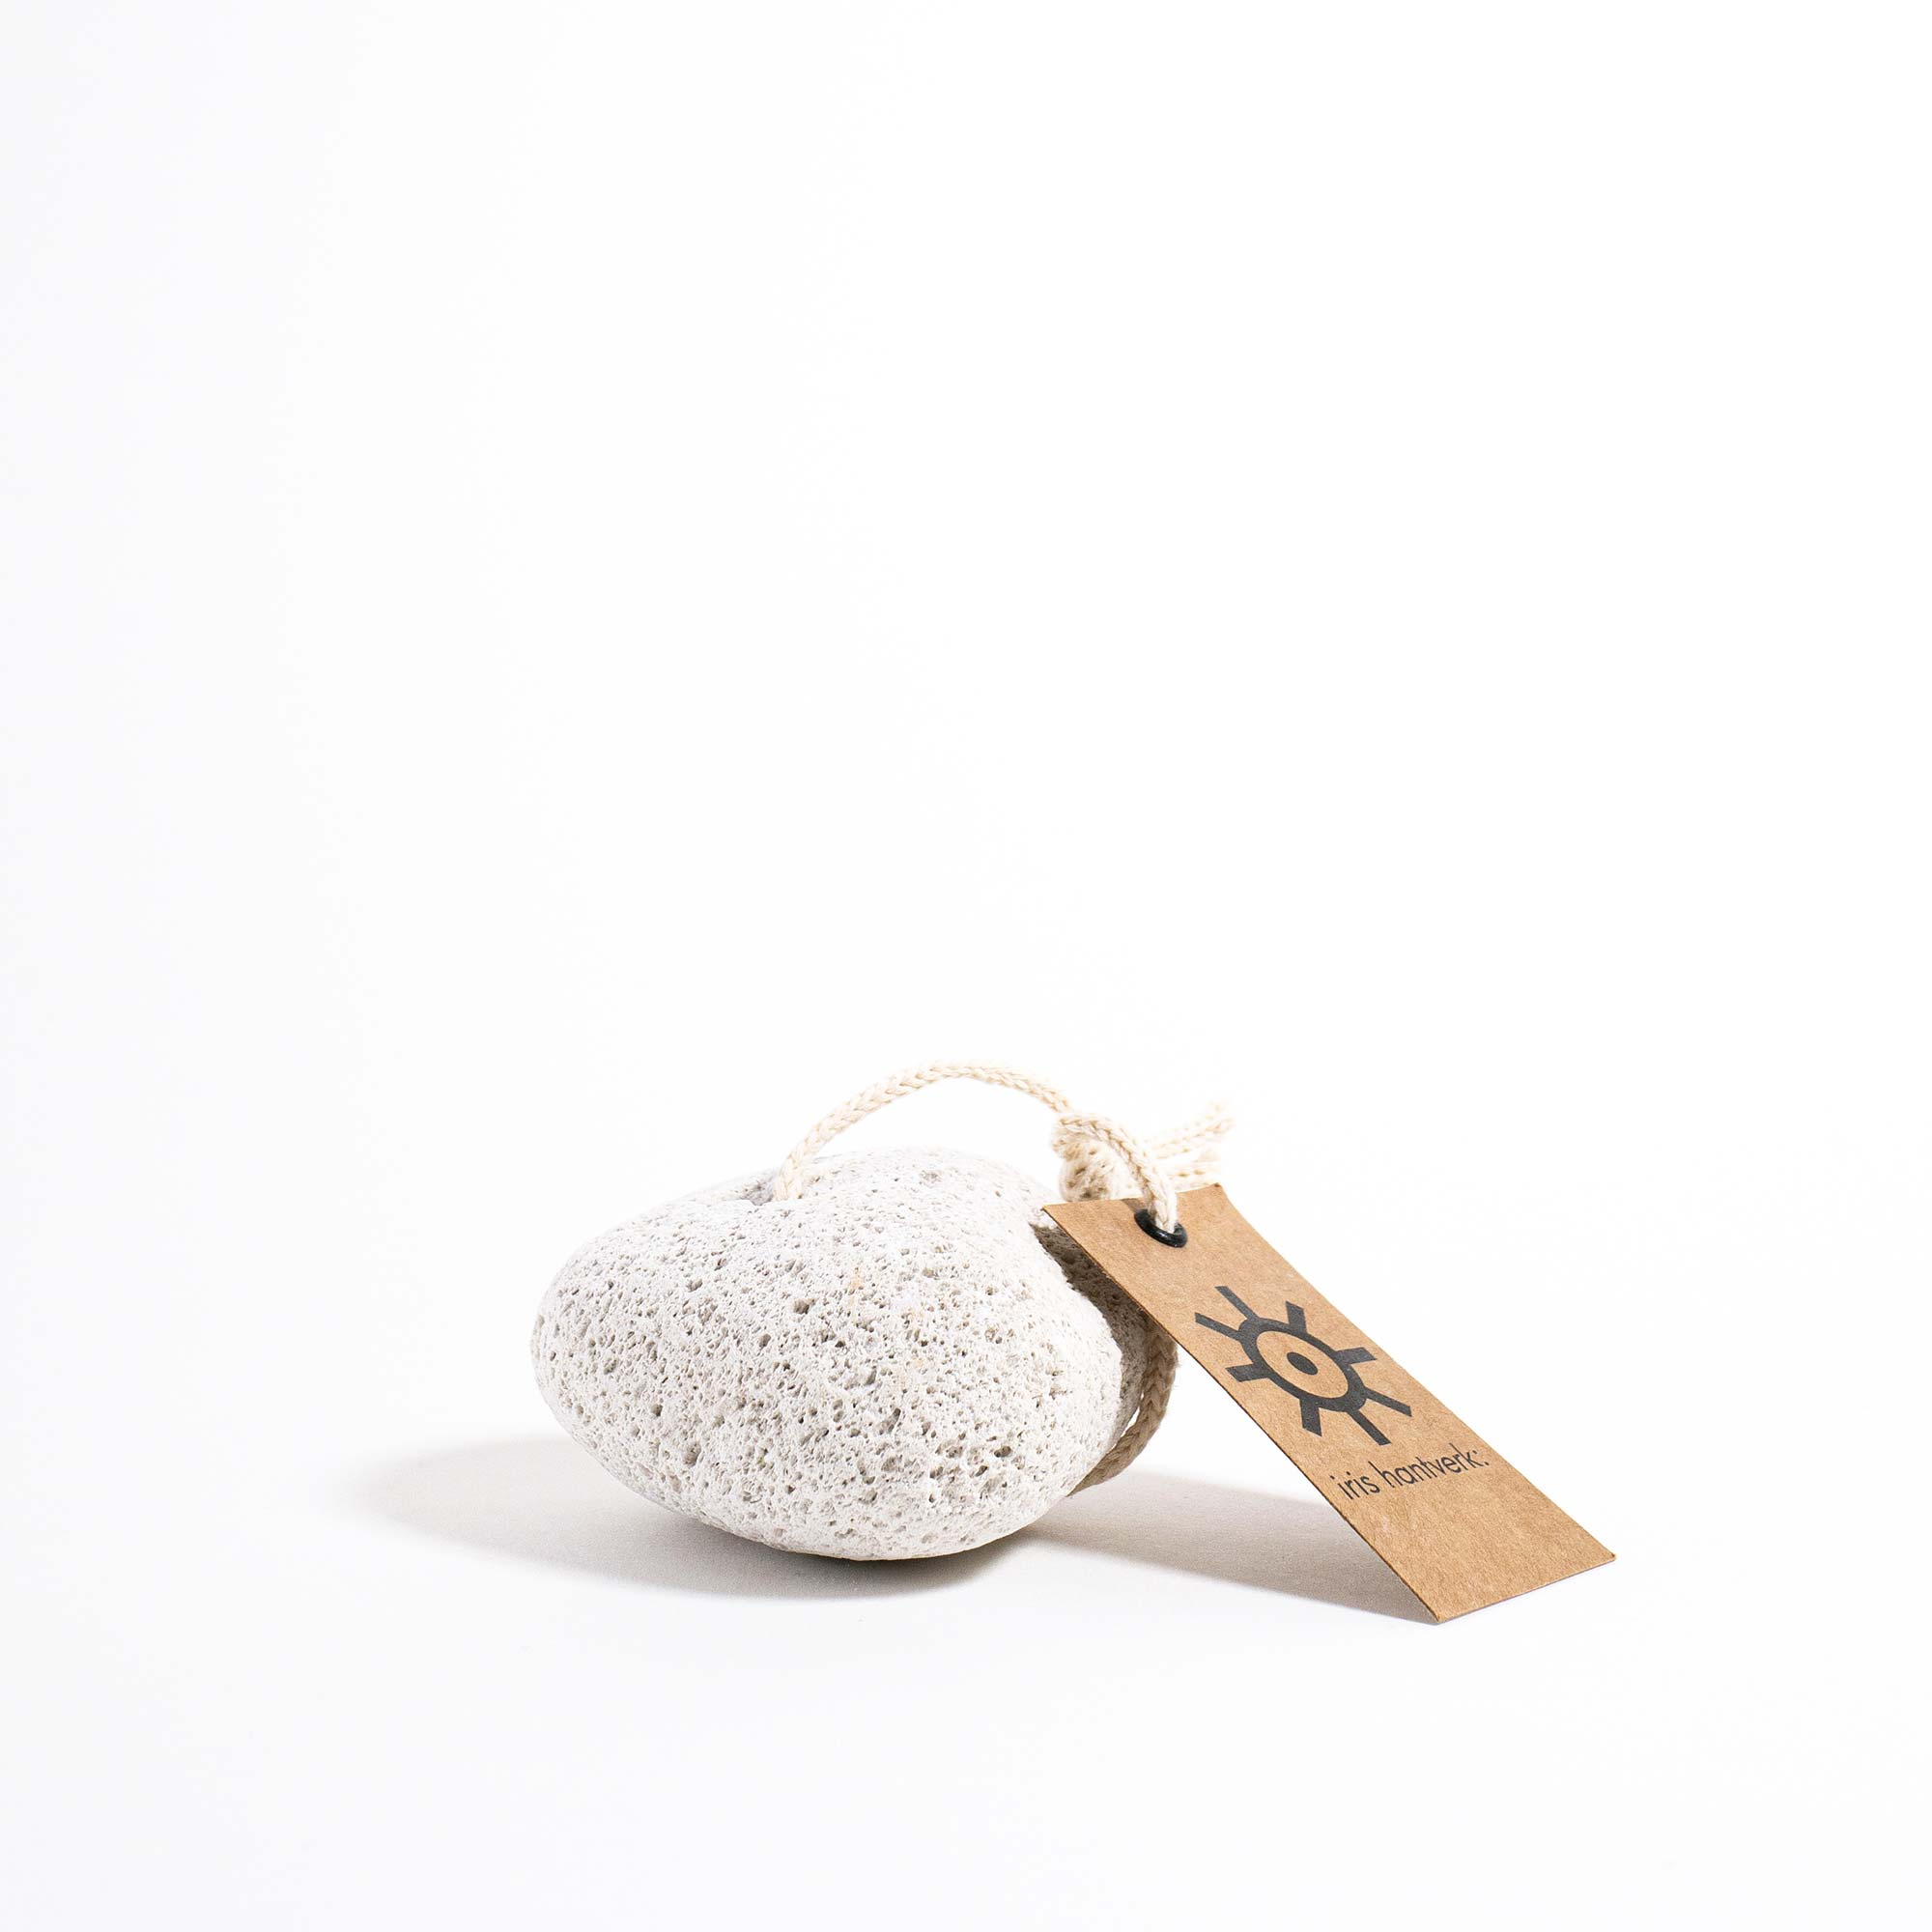 Grace and Green - Iris Hantverk - Pumice Stone 1